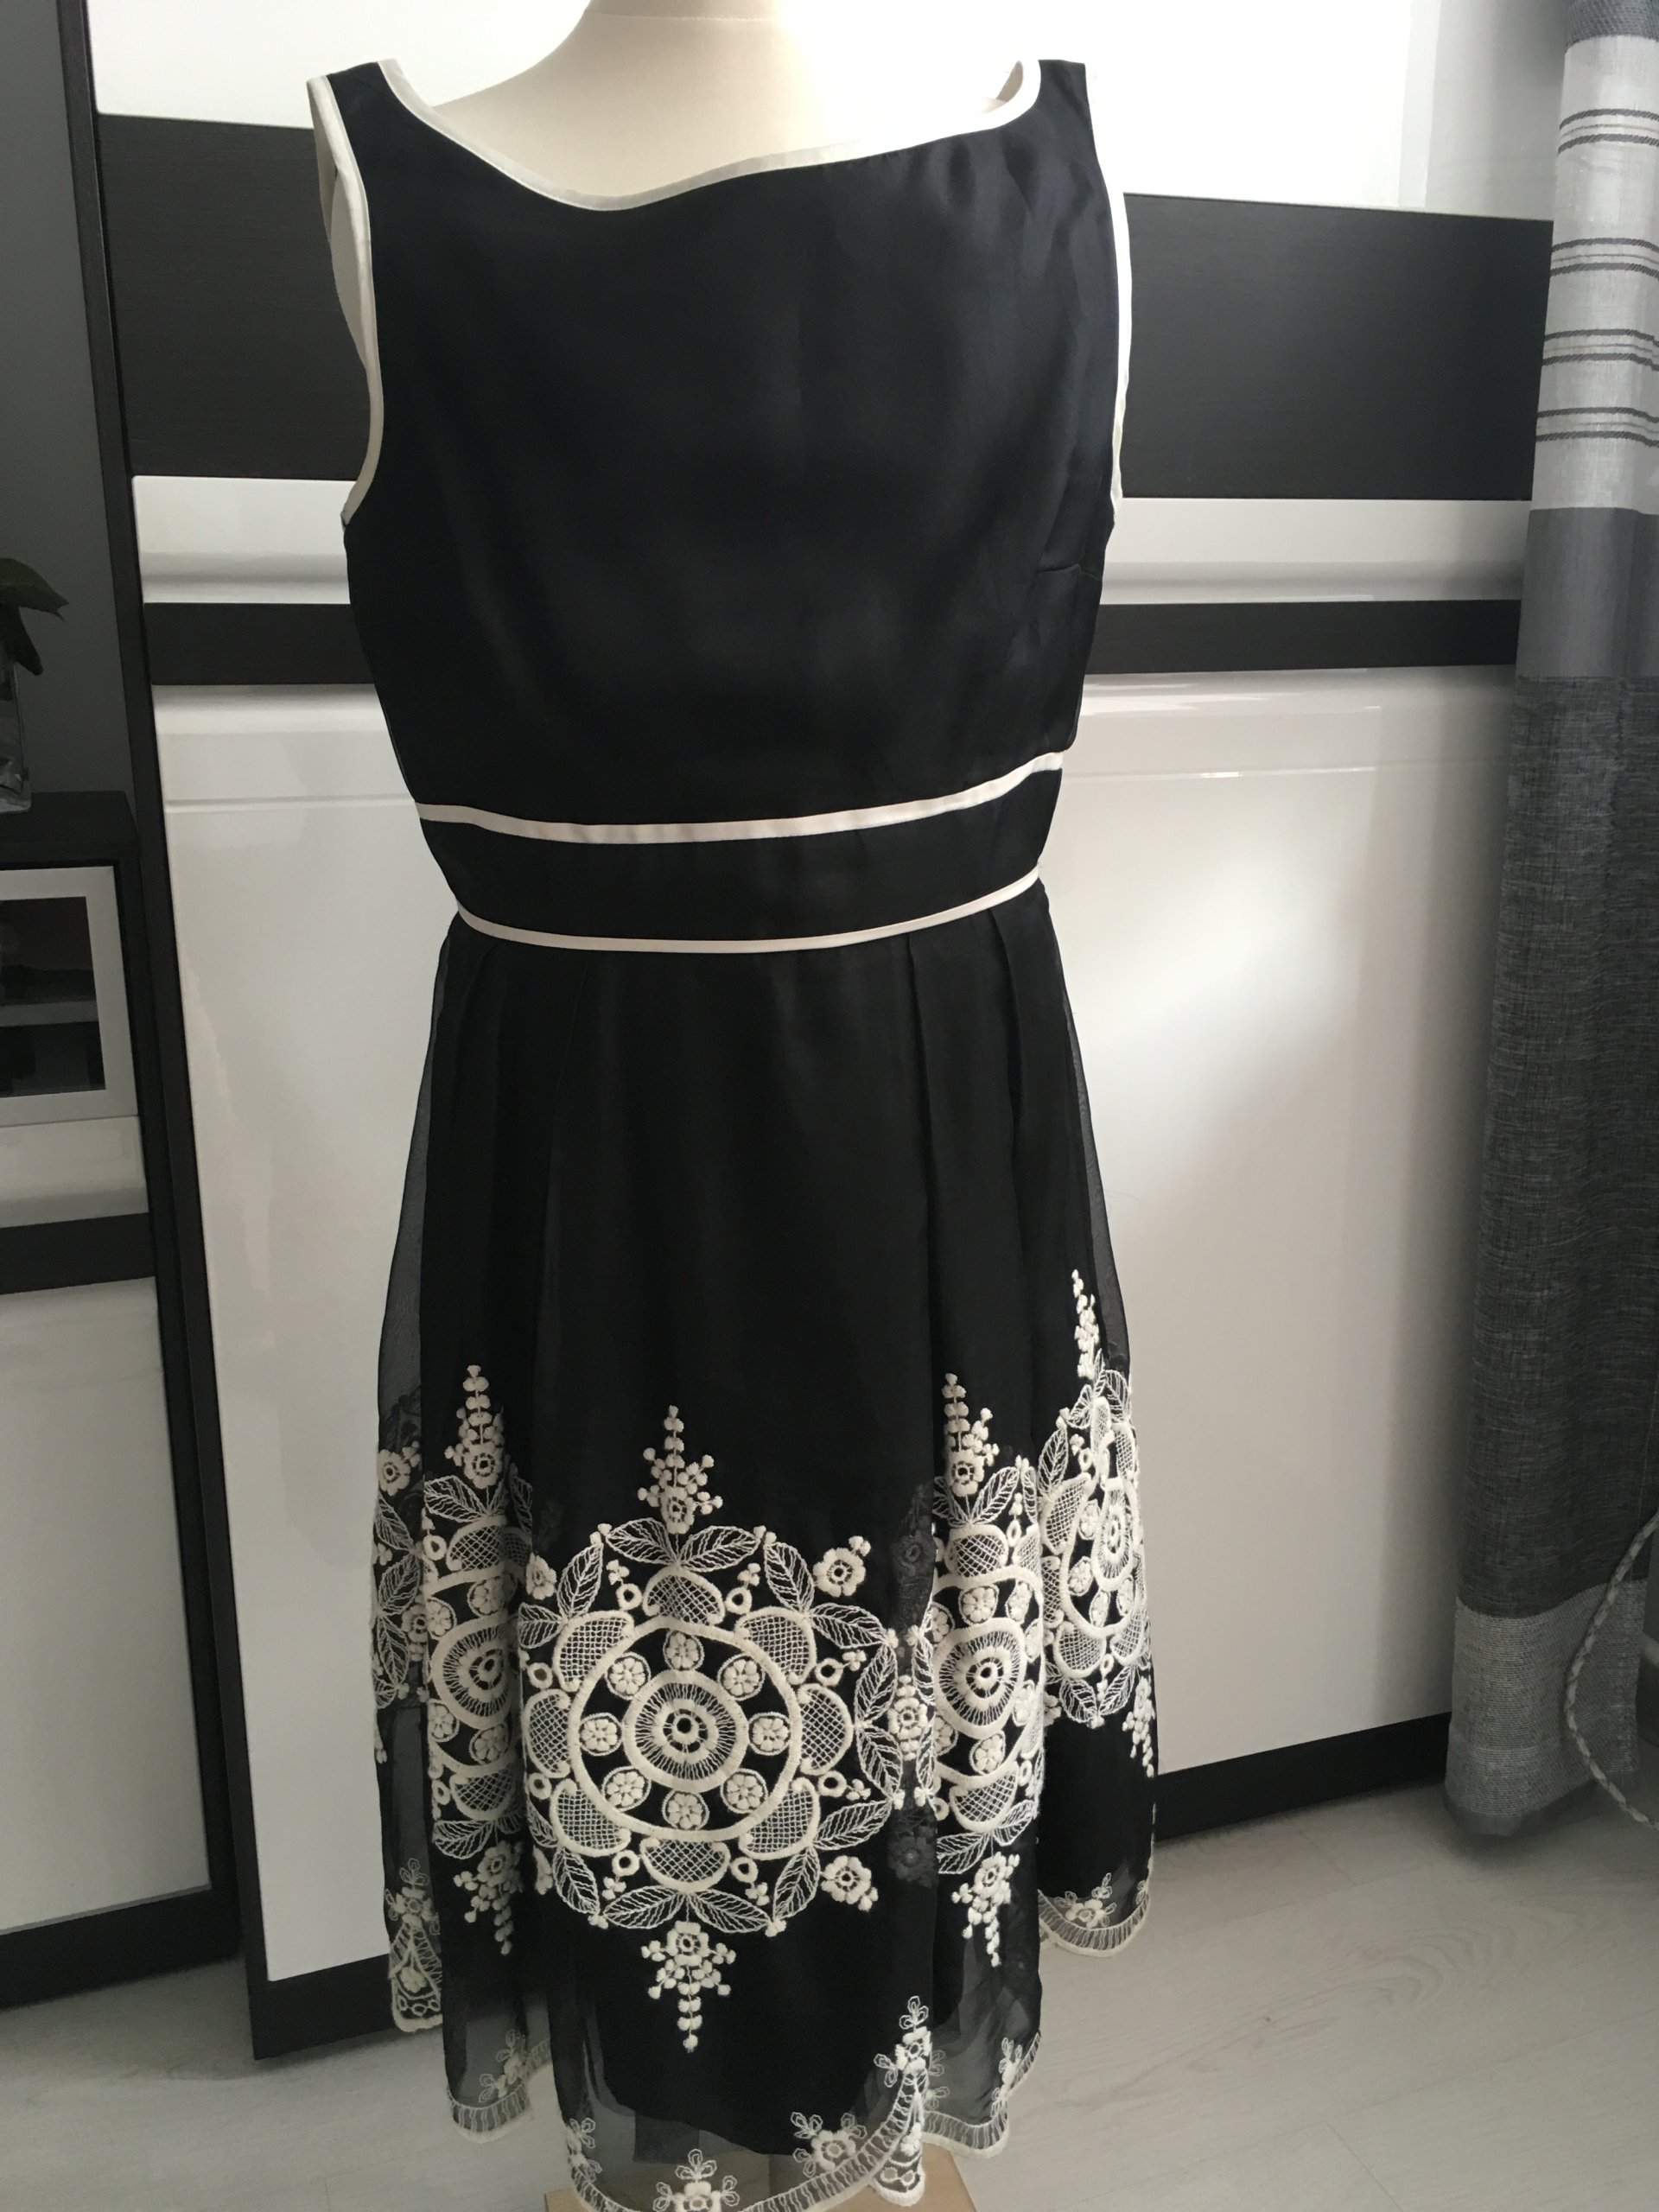 457f038f61 Sukienka SIMPLE roz 38 - 7223947191 - oficjalne archiwum allegro